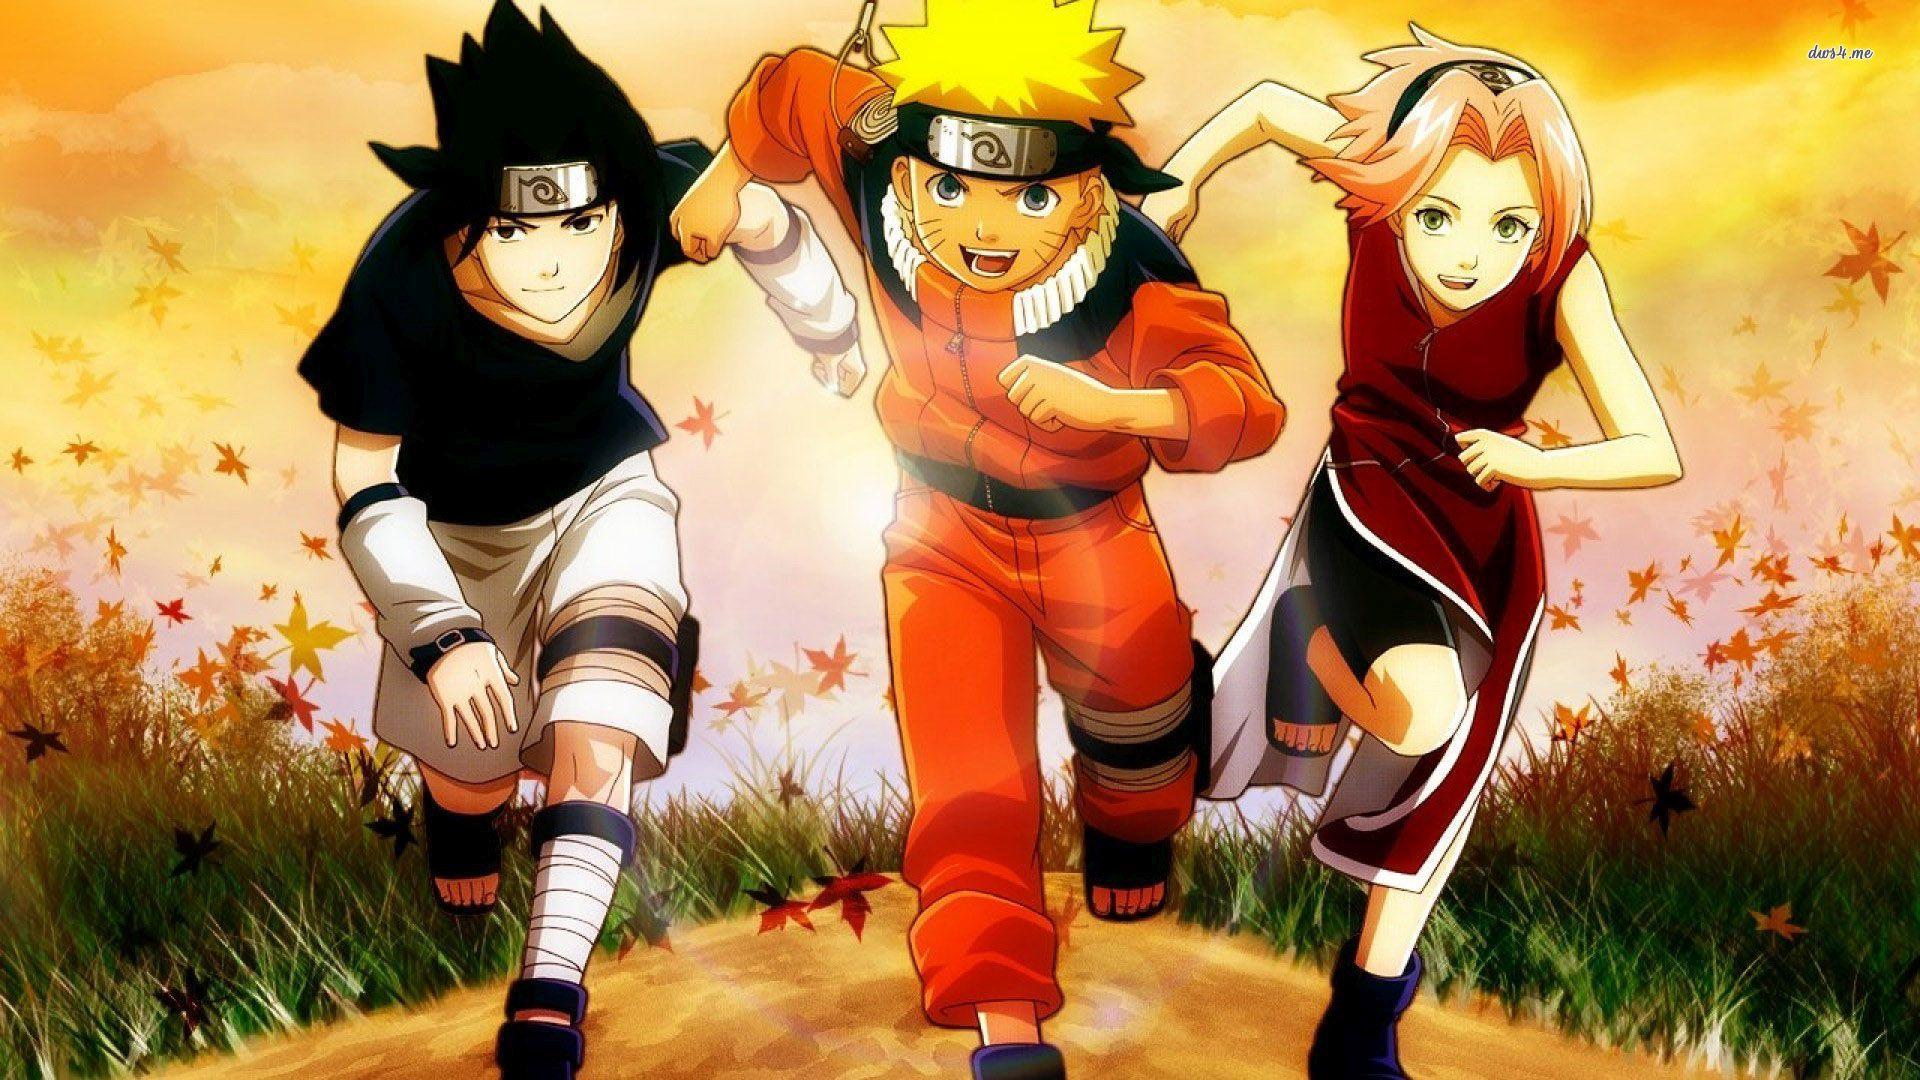 Download Naruto Wallpapers 006